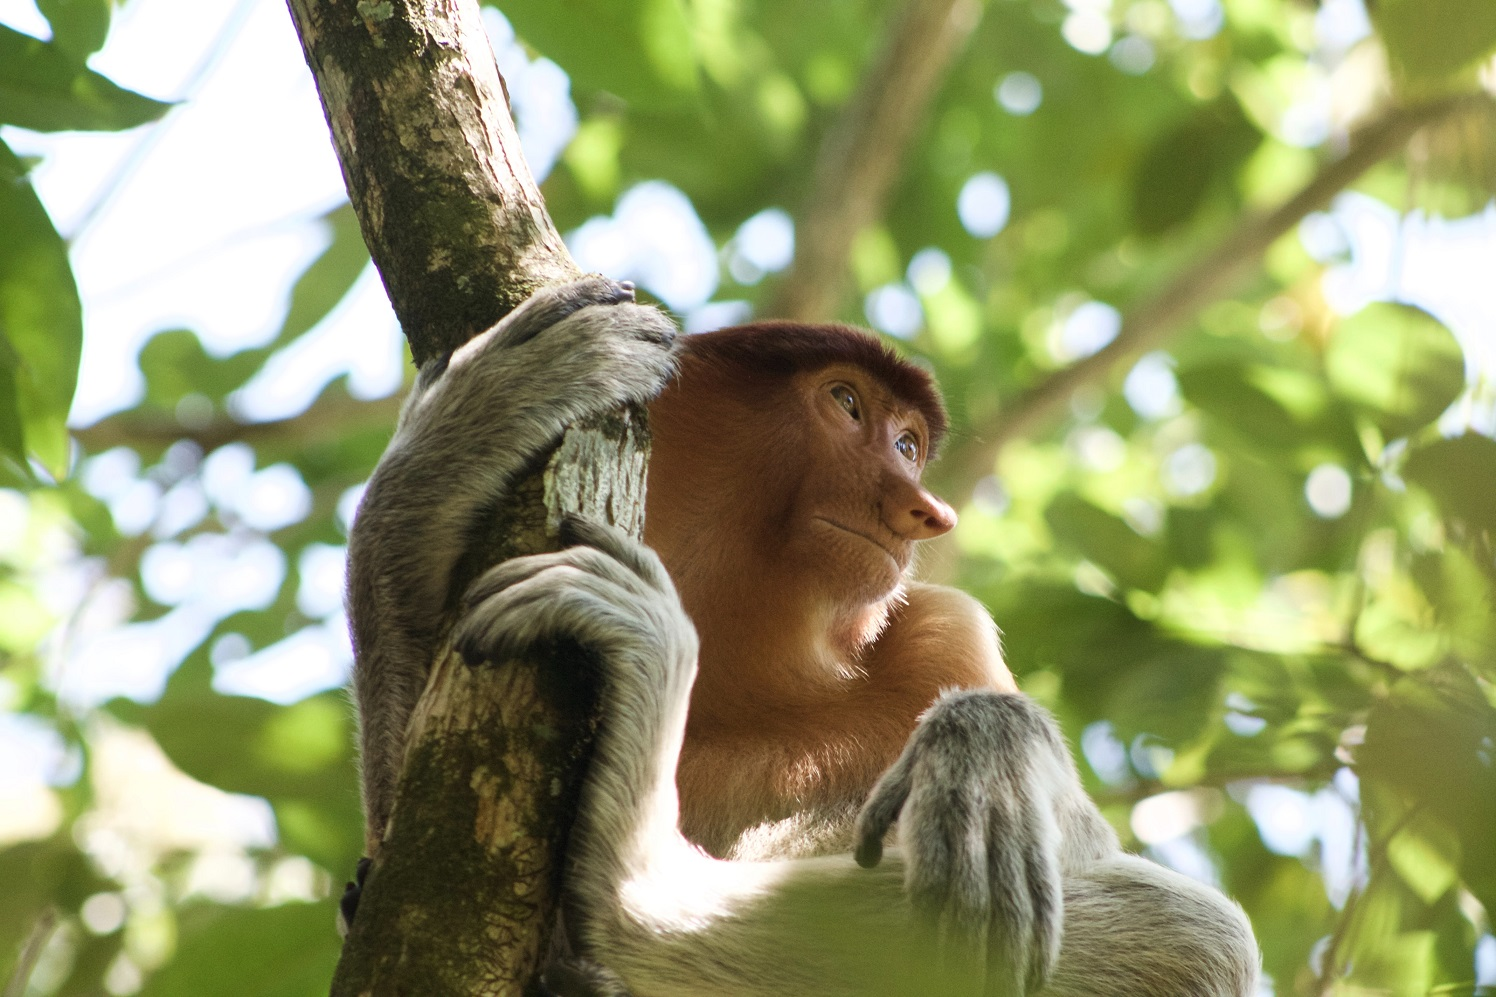 Bako National Park, Kuching, Malaysia. joshua-stitt-_HV9JRENahE-unsplash